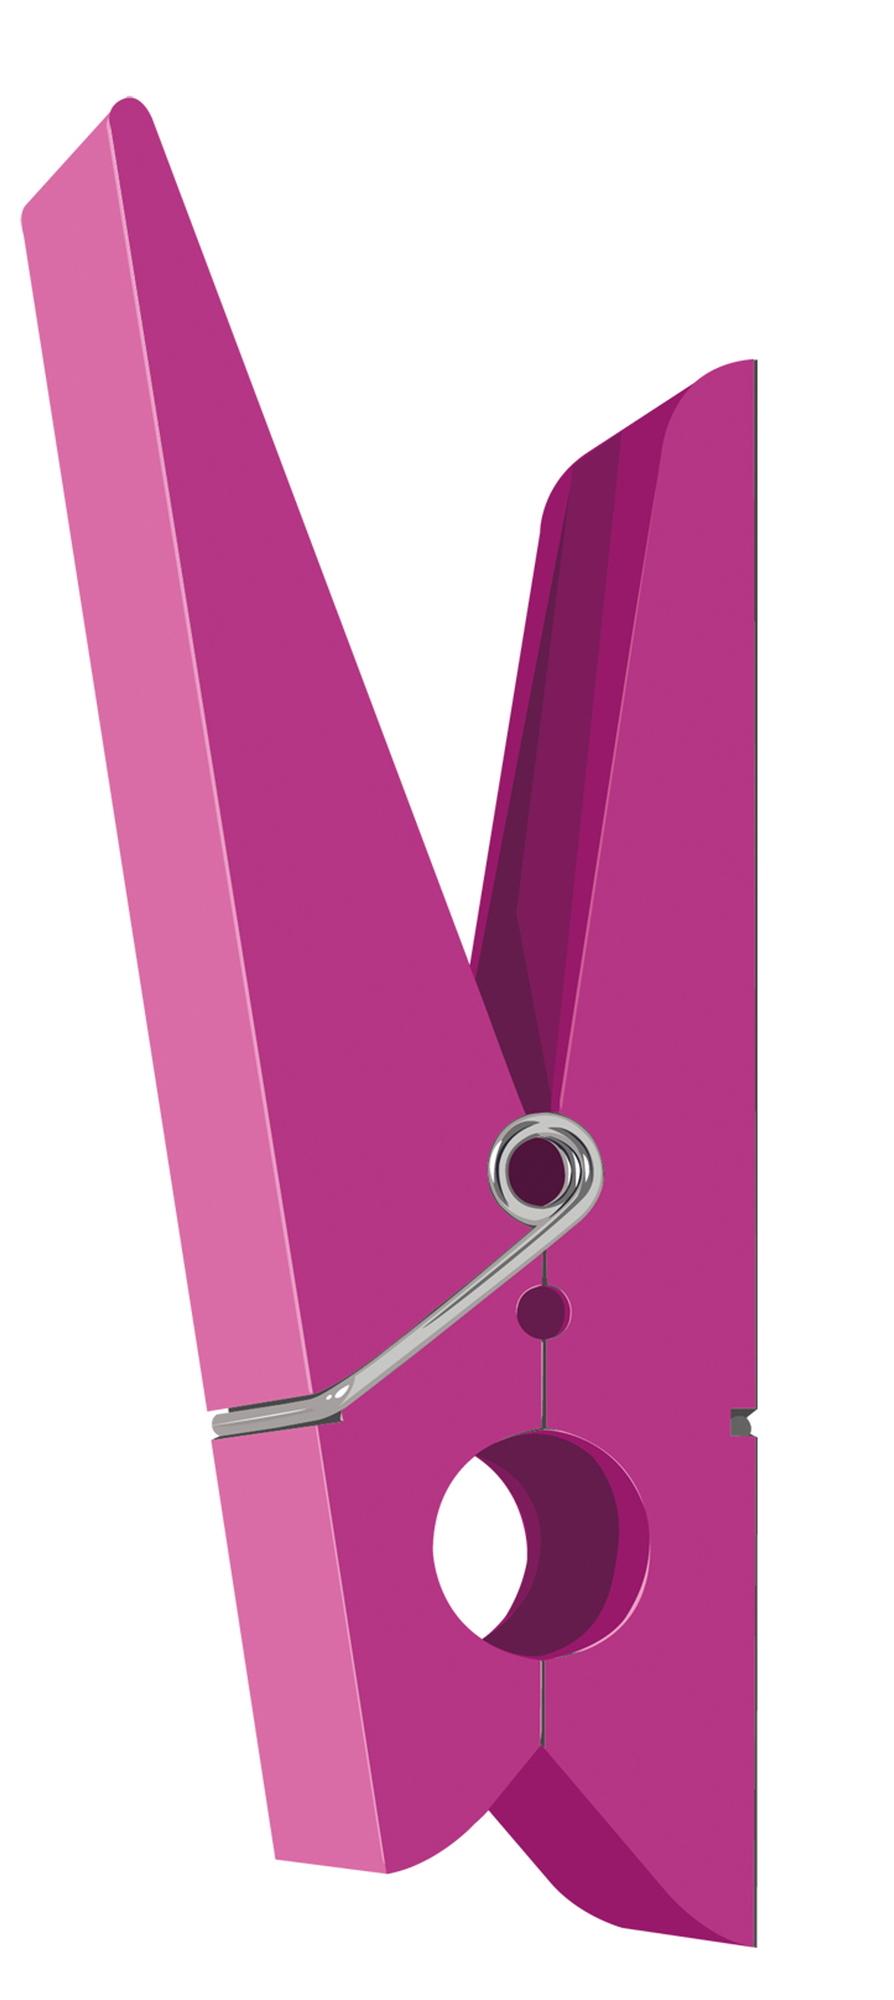 Pince Alors Kleiderhaken Swabdesign Pink